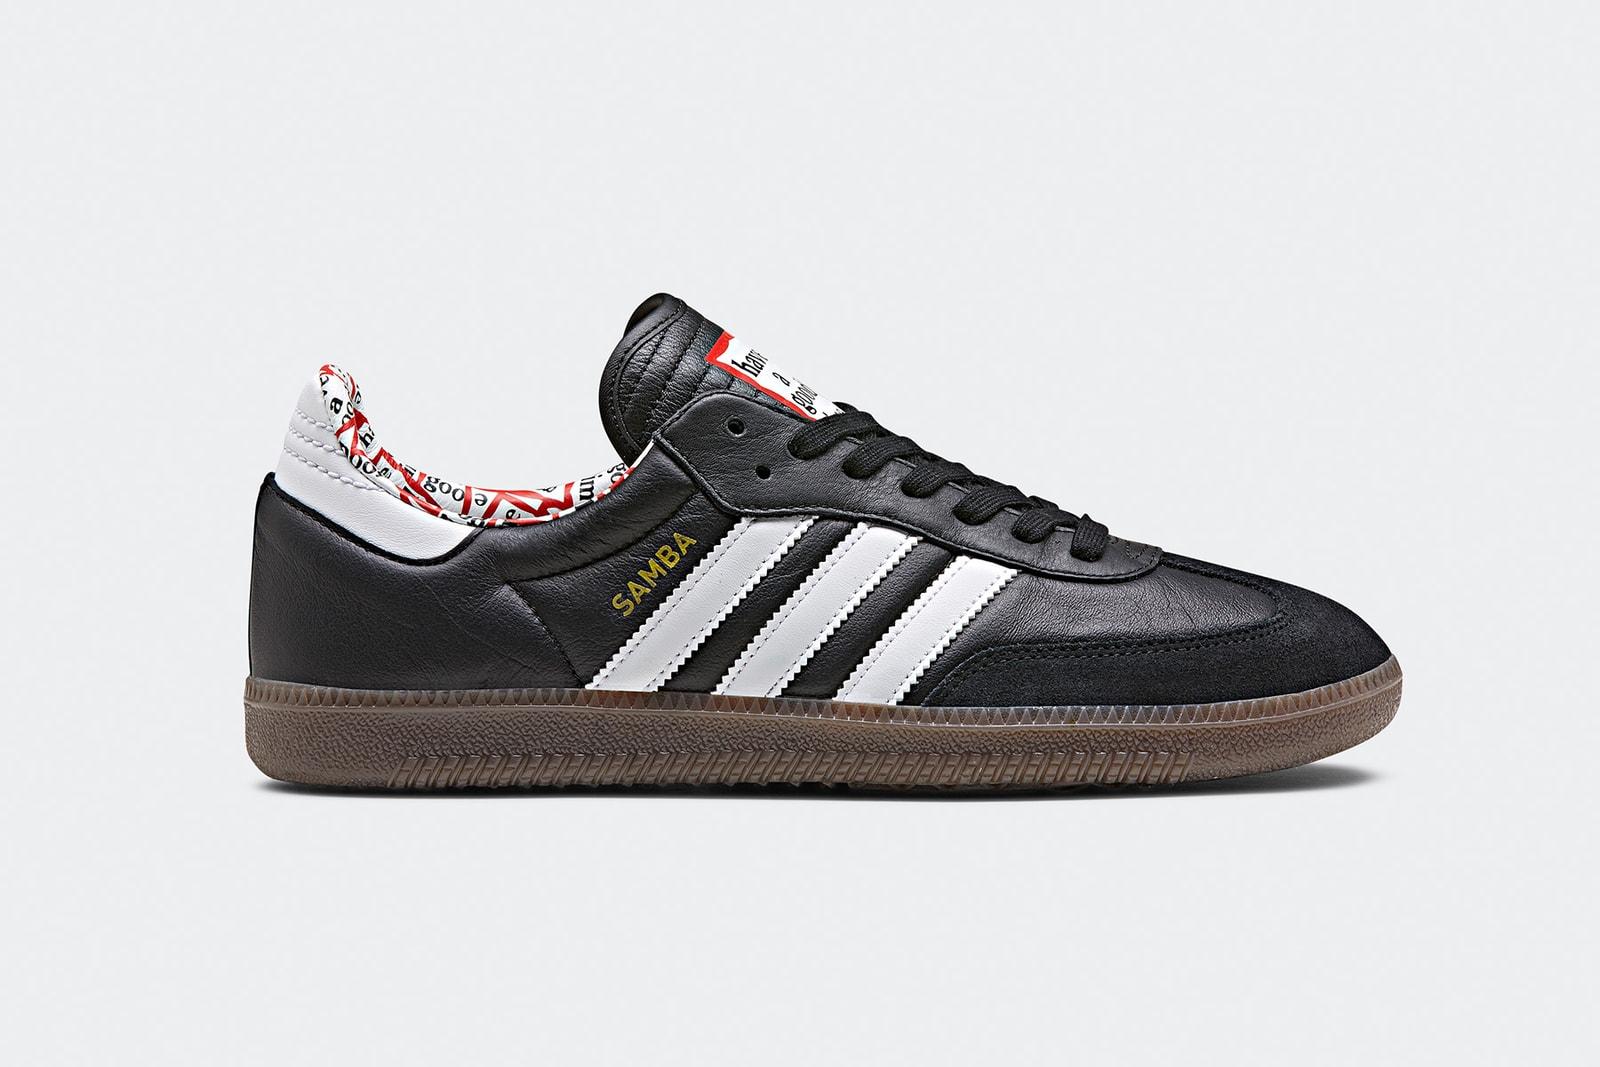 adidas Originals アディダス オリジナルス ハブアグッドタイム have a good time コラボ samba サンバ